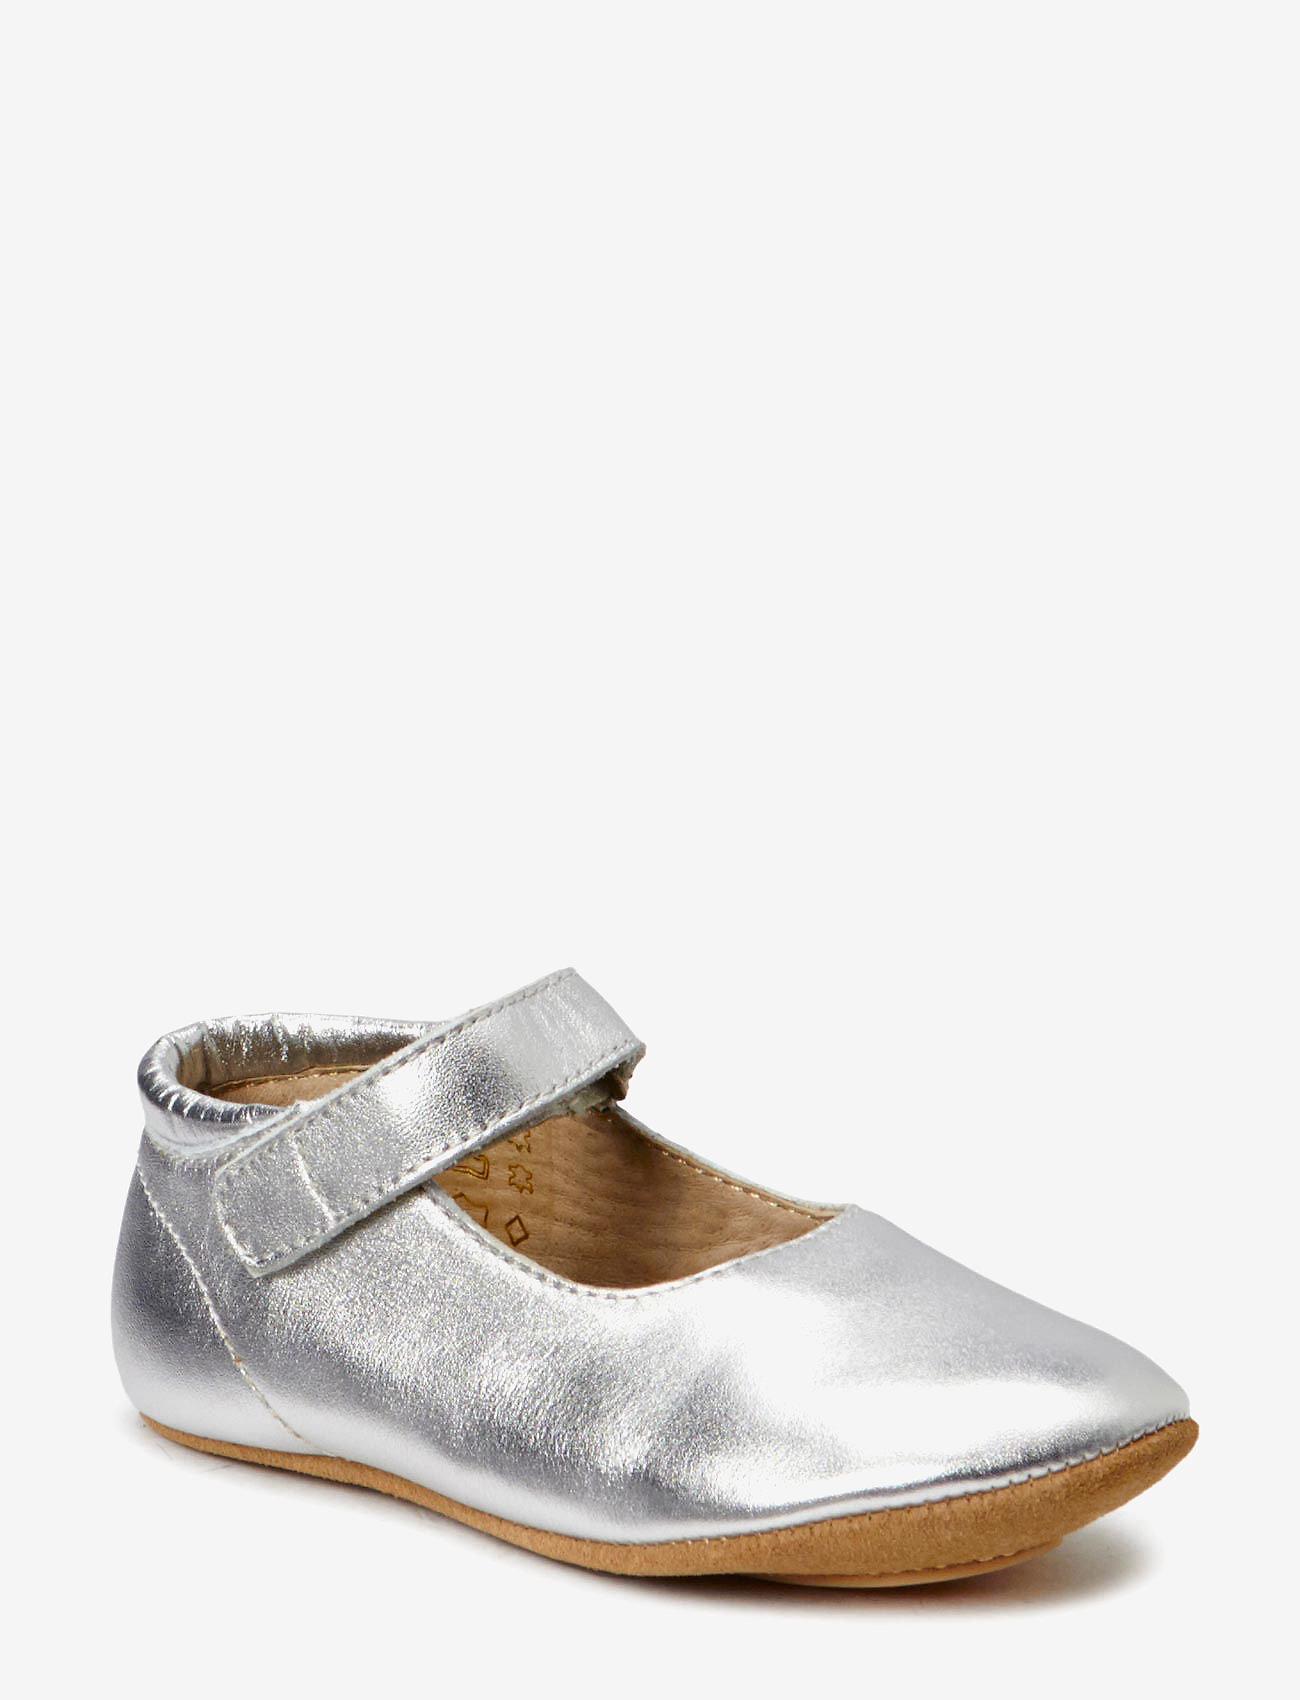 Bisgaard - SLIPPERS BALLERINA - pantoufles - 01 silver